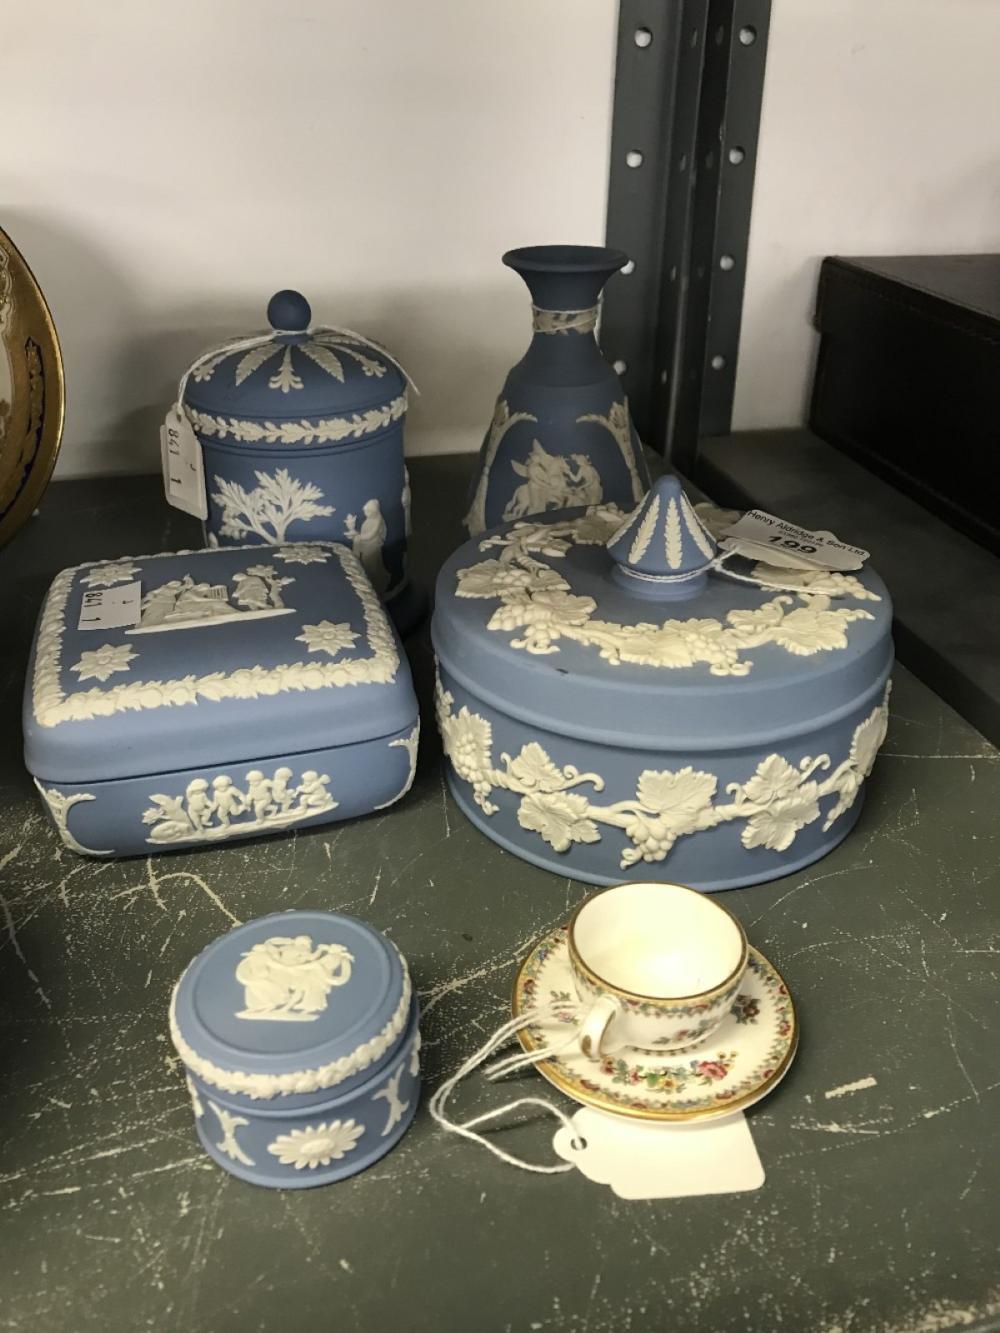 20th cent. Ceramics: Wedgwood blue/white Jasperware circular powder bowl and cover, square trinket b